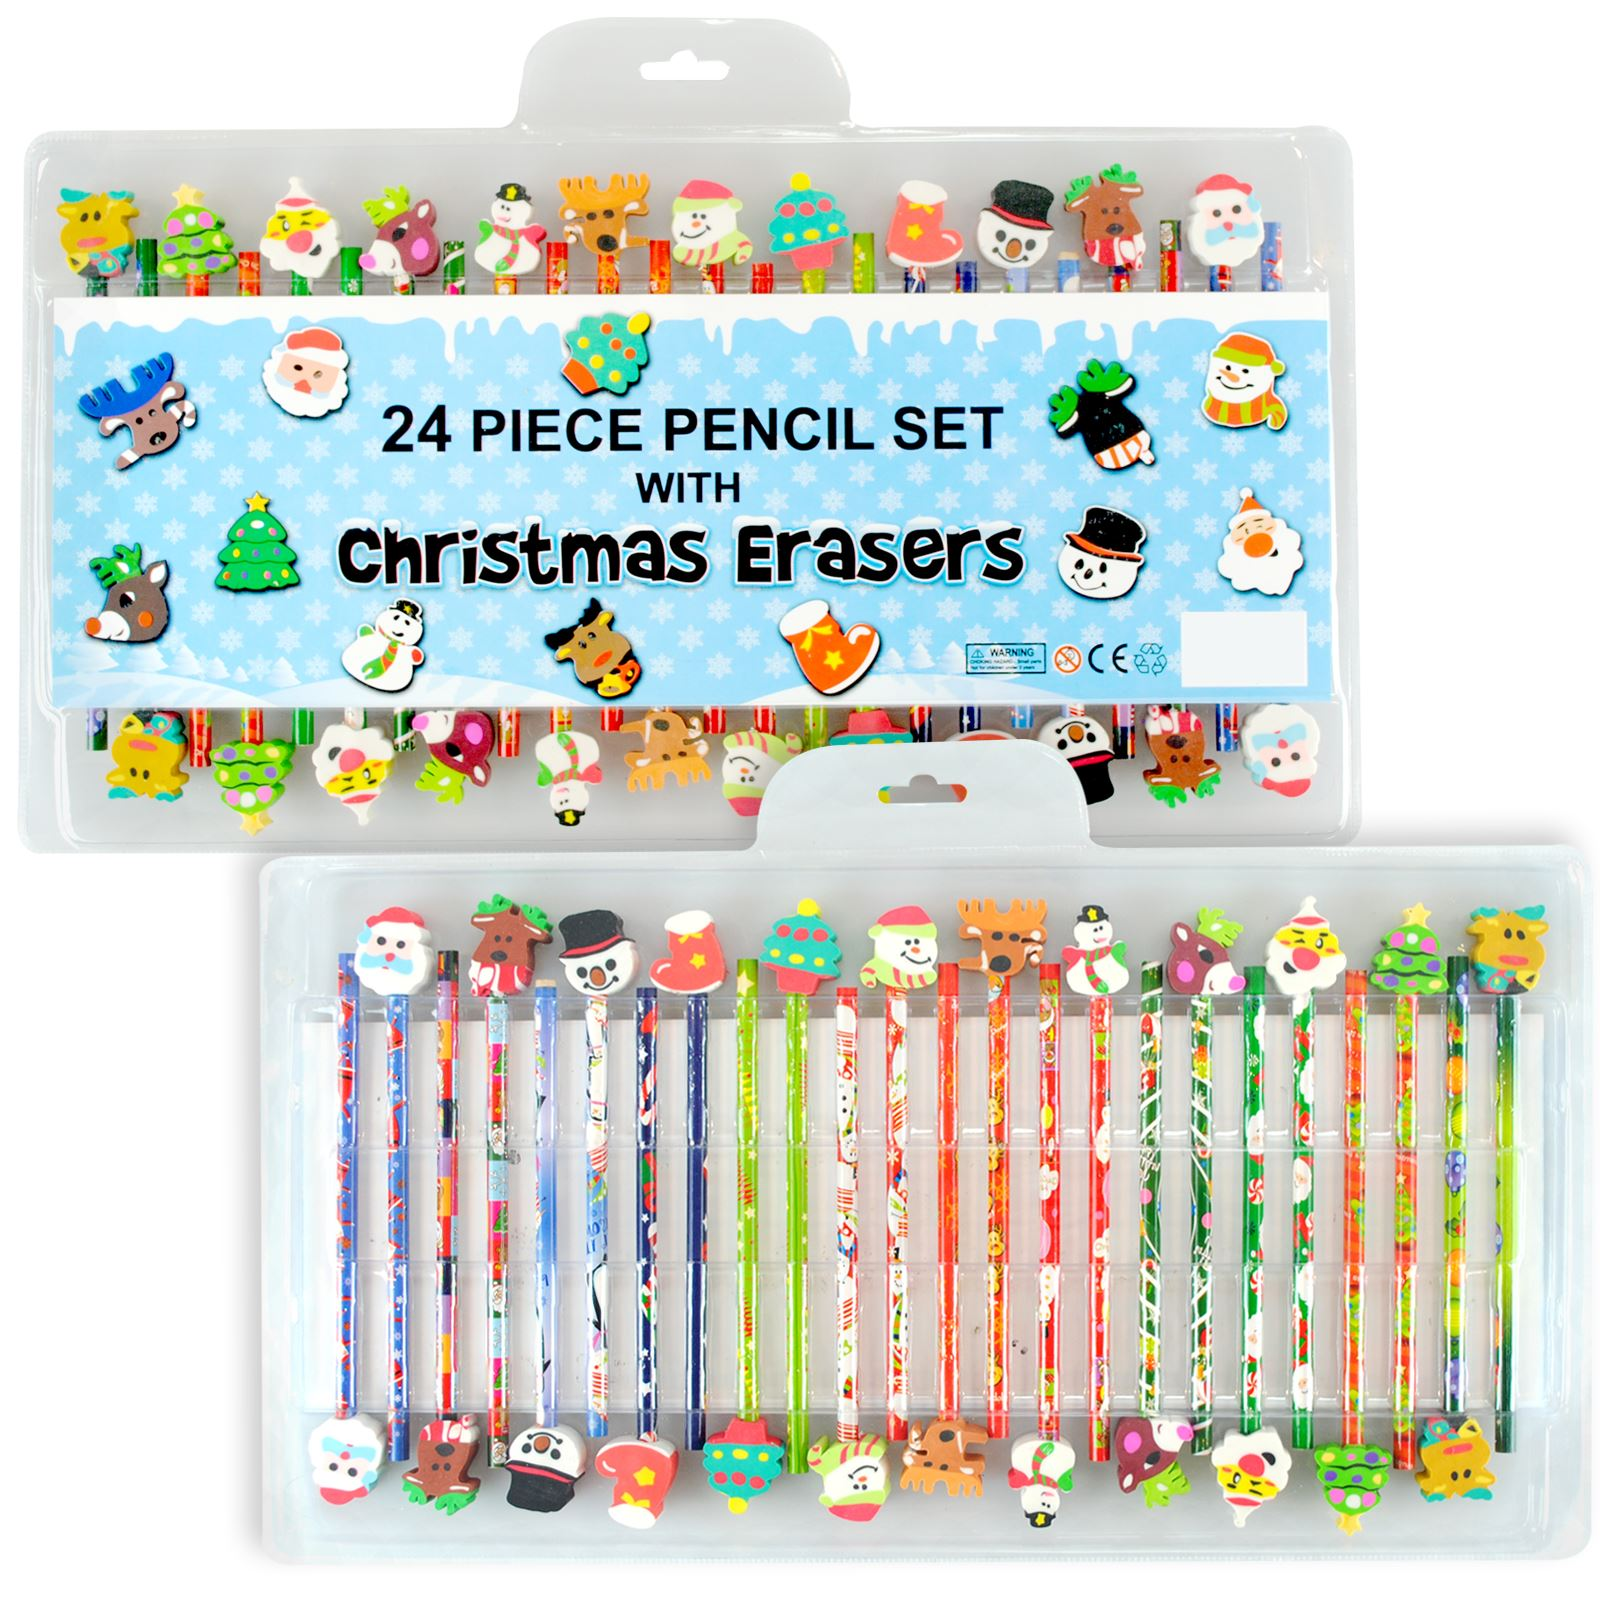 Kids 24 Piece Pencil Stationary Set With Christmas Eraser